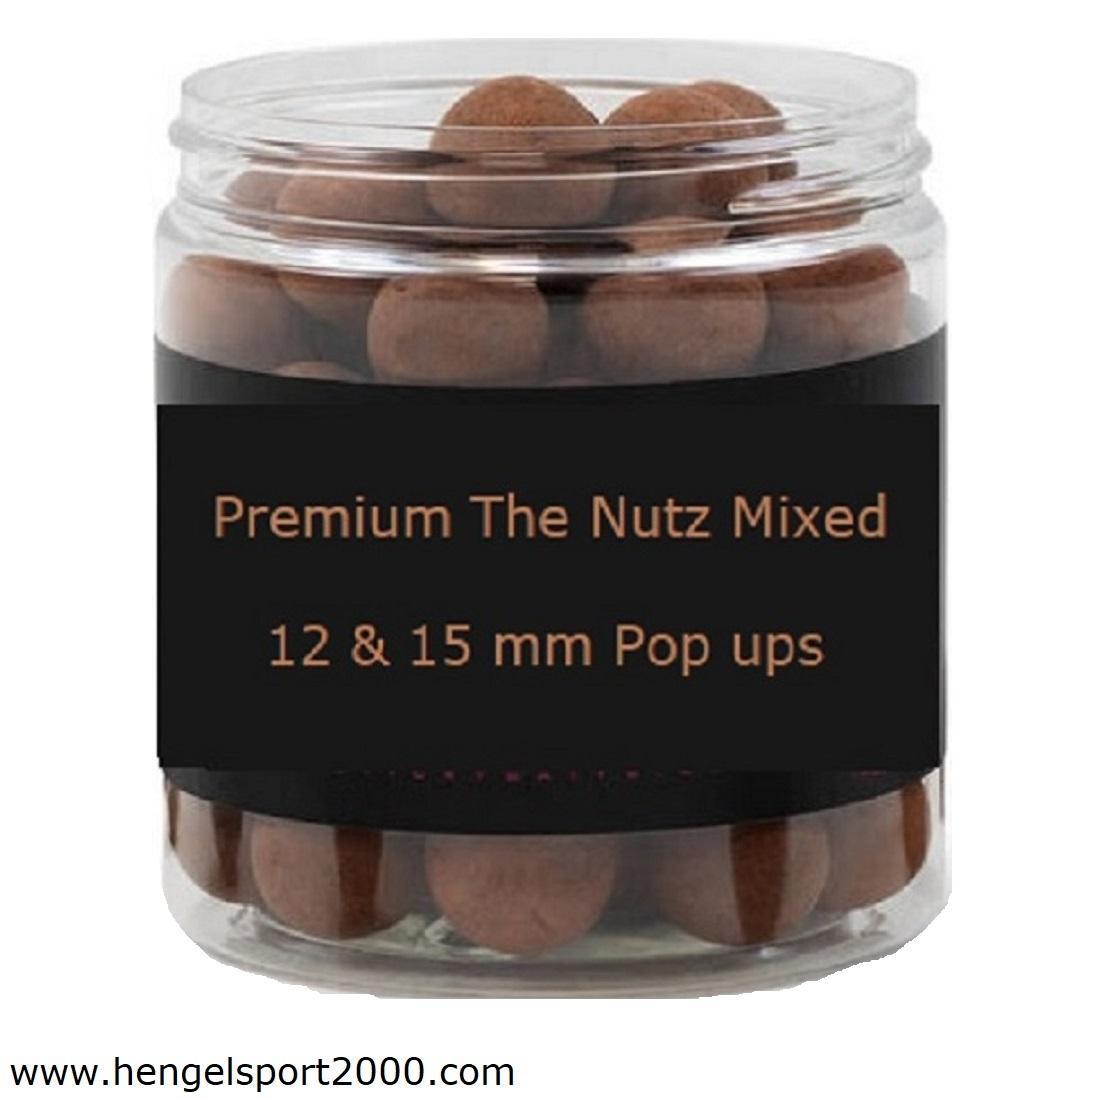 Premium The Nutz Mixed Pop ups